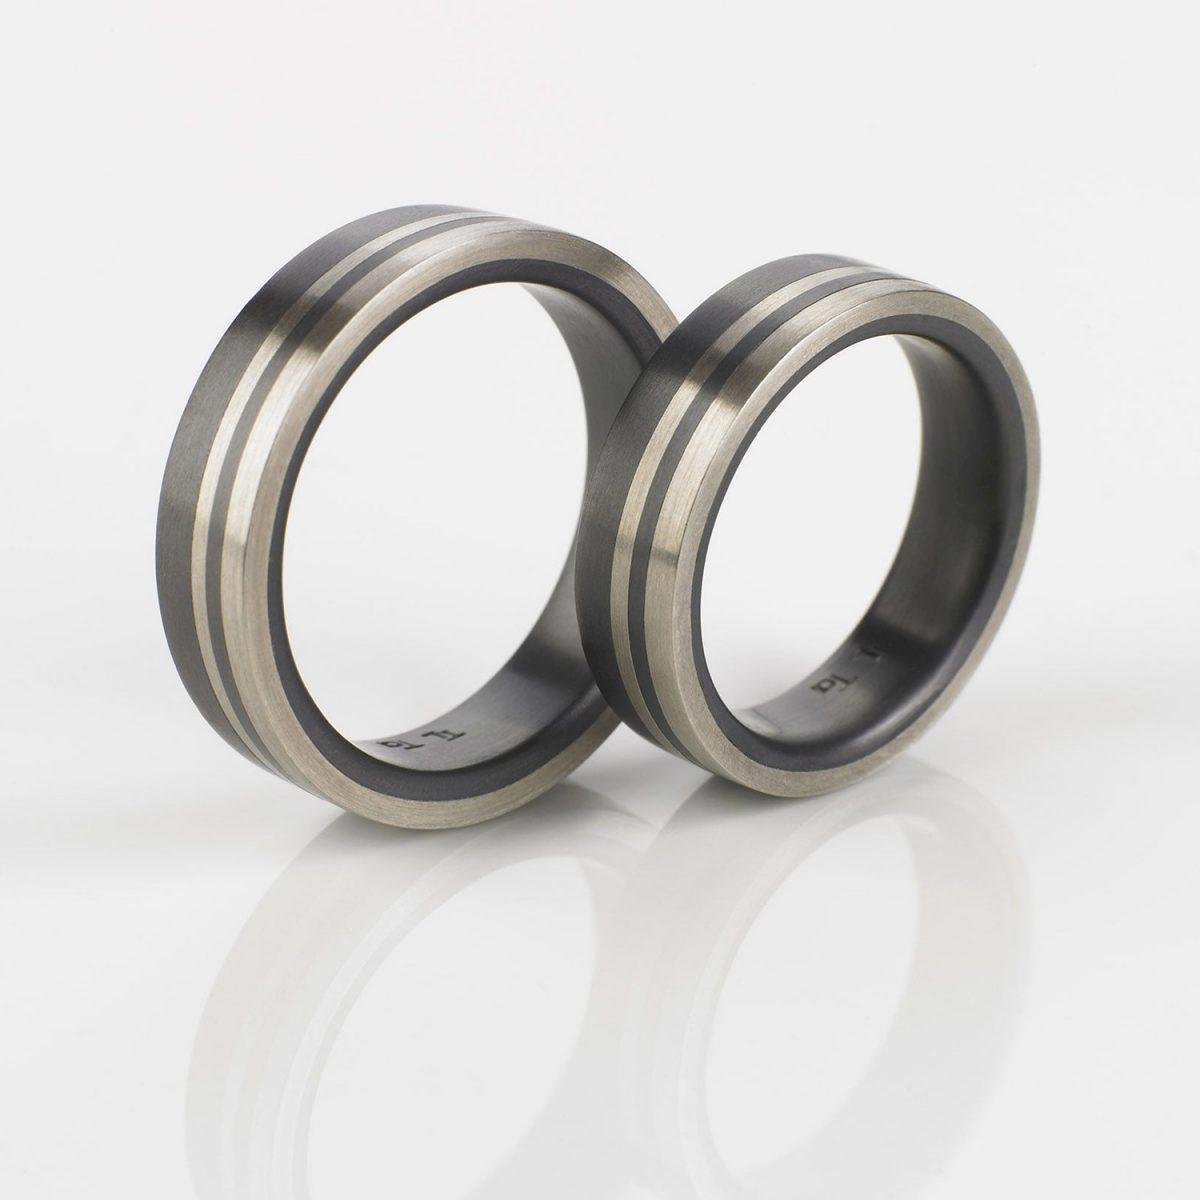 Tantal Hochzeitsring | Eheringe | Ringpaar True Love Collection No:31